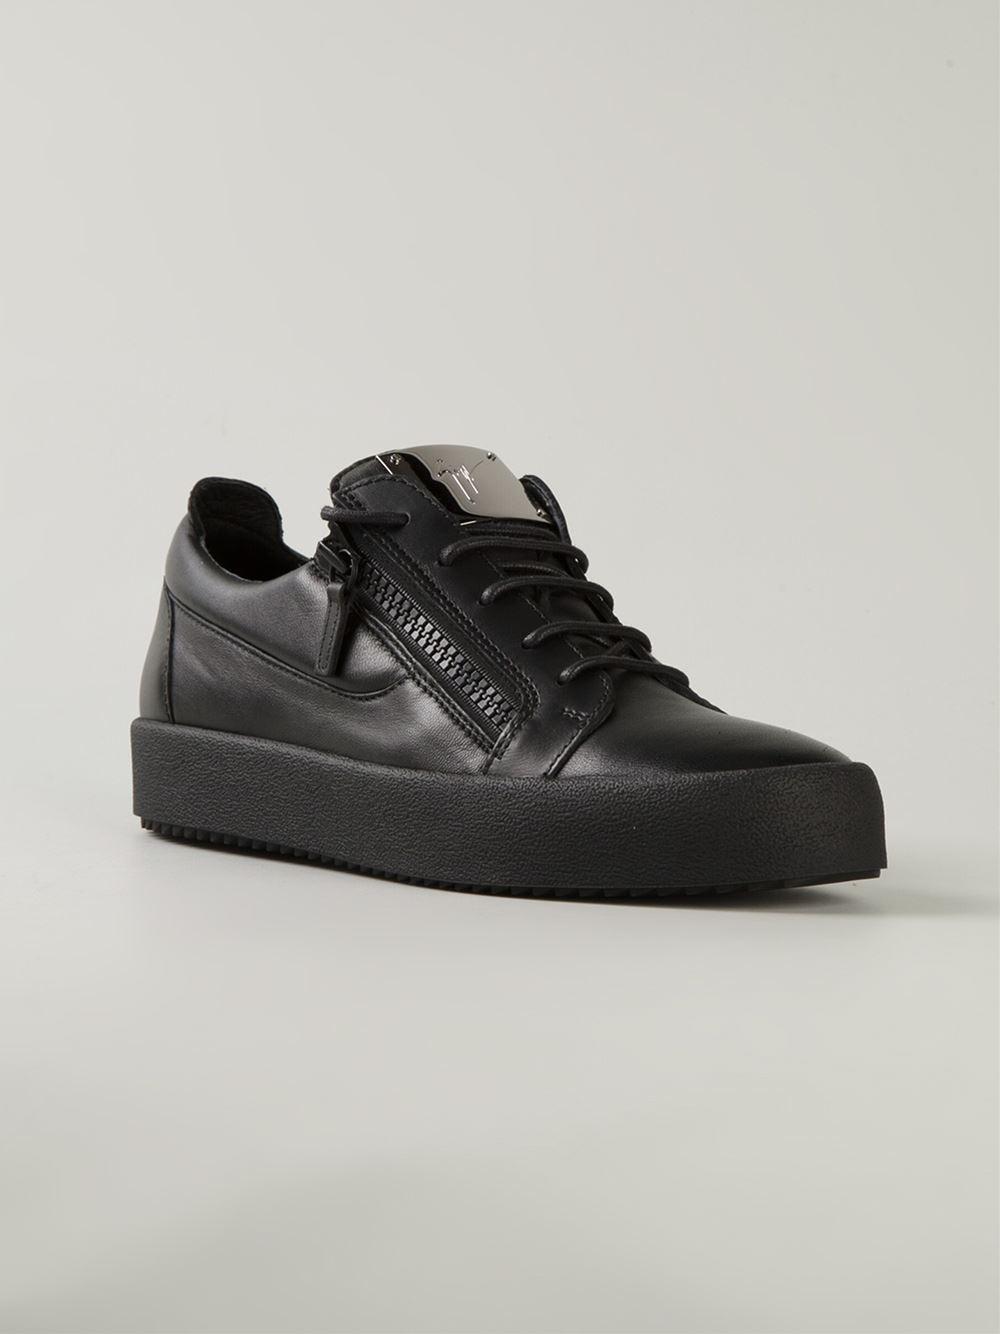 Giuseppe Zanotti Mens Shoes Review